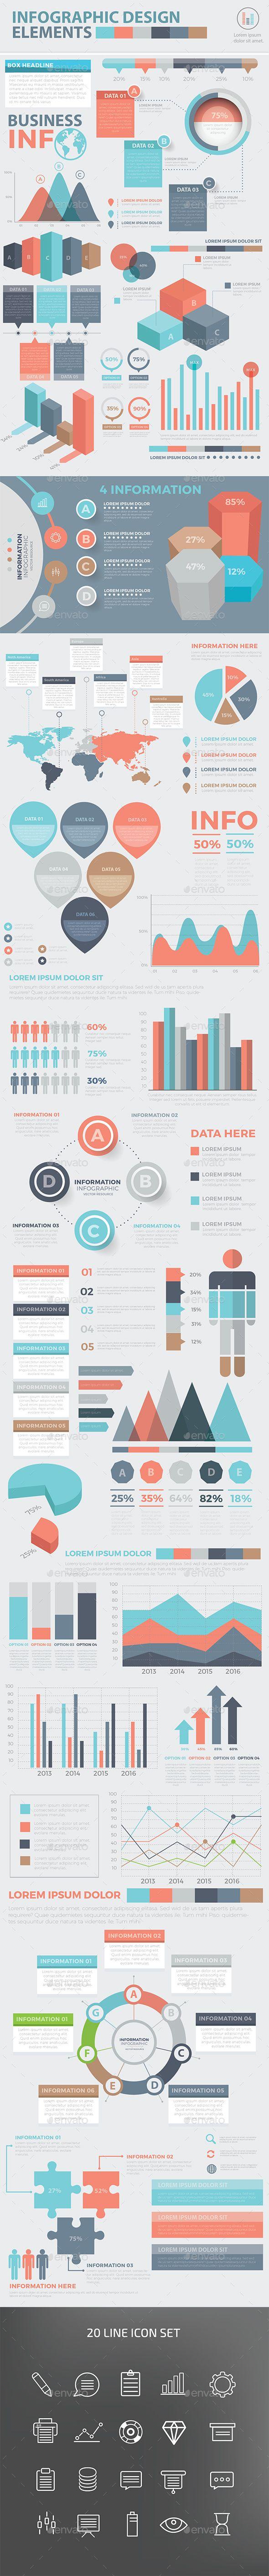 Modern Infographic Elements Design Templates Vector EPS, AI Illustrator. Download here: http://graphicriver.net/item/modern-infographic-elements-design/16723876?ref=ksioks